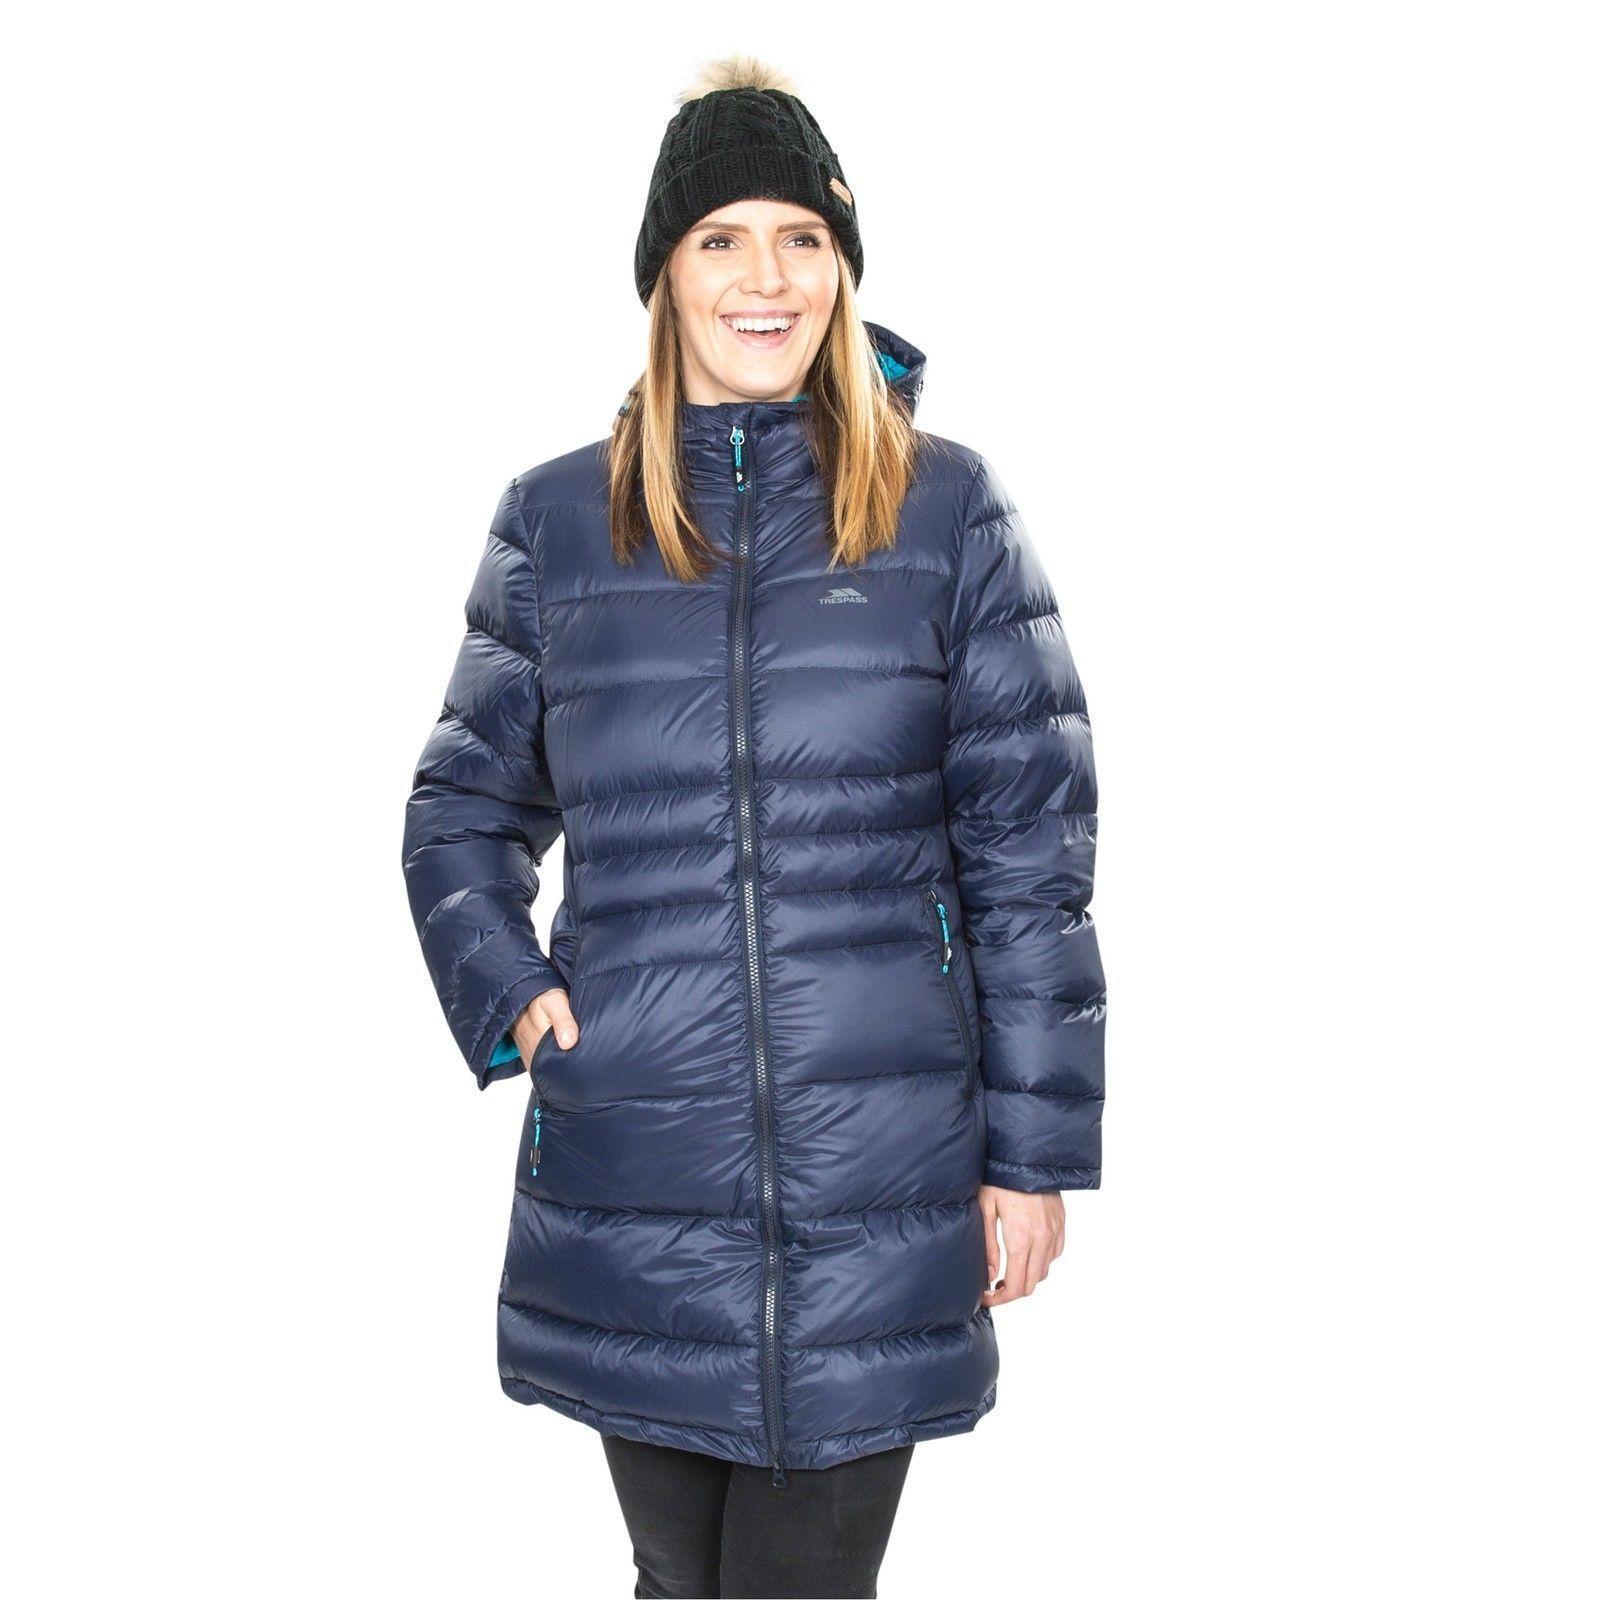 ce1a7585a03 Trespass pure down jacket Warm Womens Down Jacket Winter Long Ladies Parka  Coat